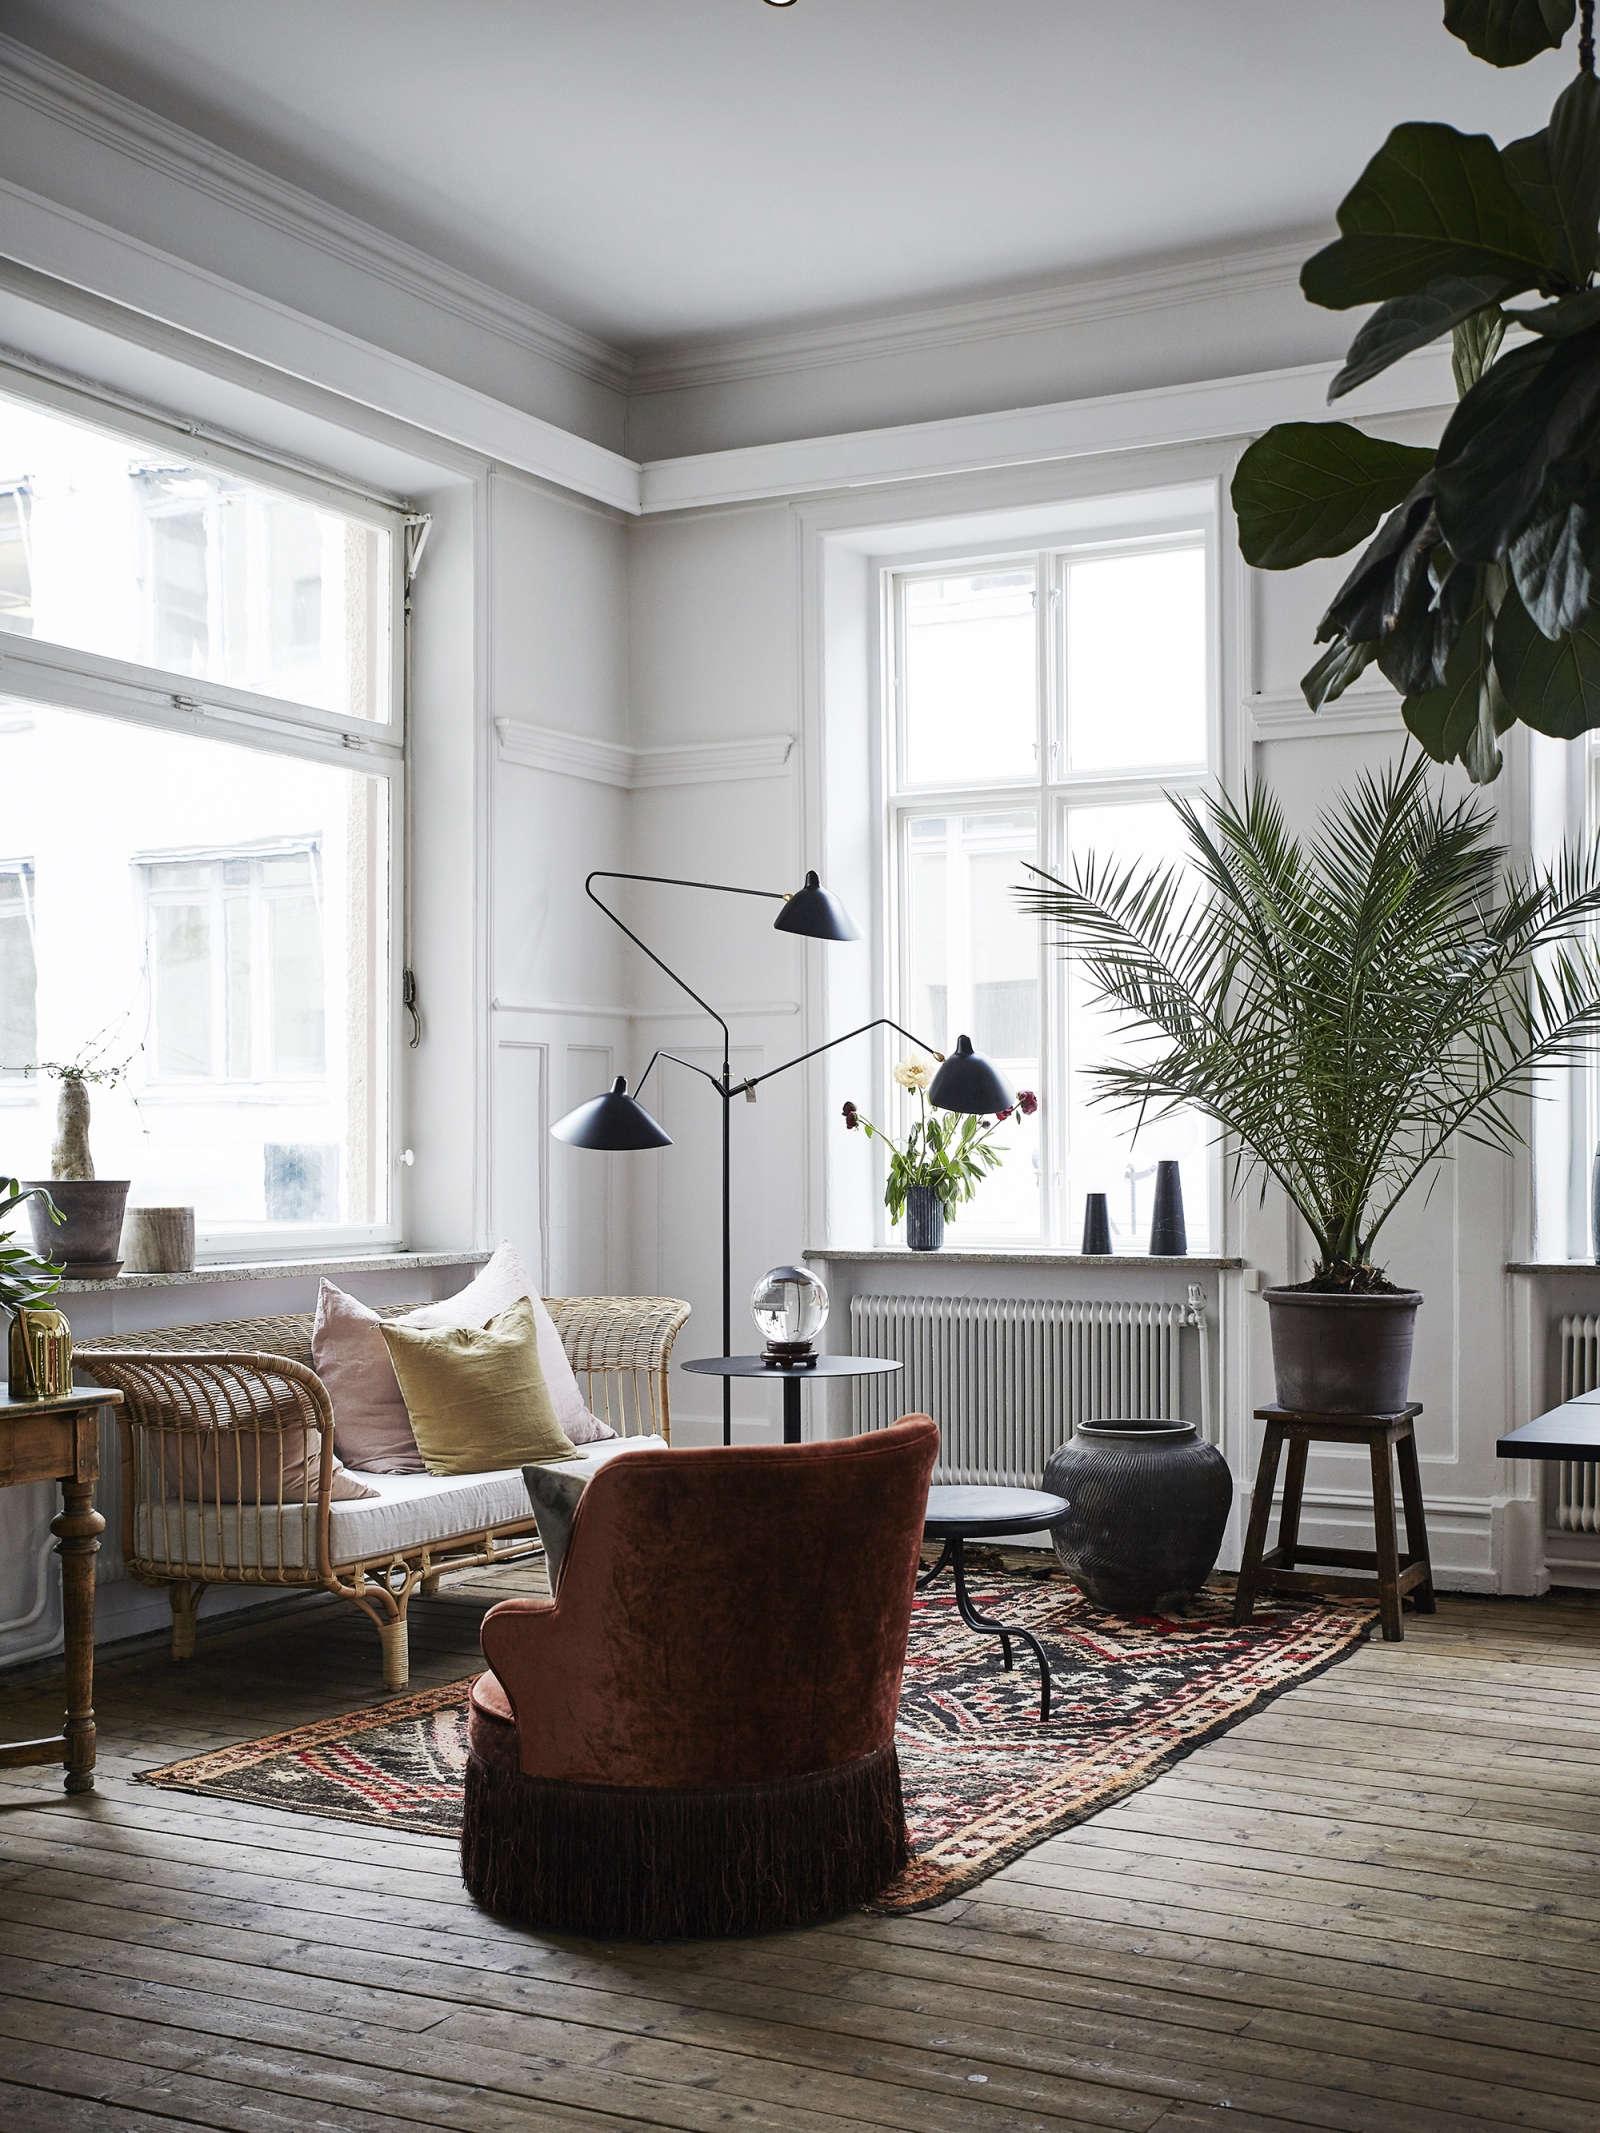 Trend Alert Rattan Furniture Made Modern Plus 15 to Buy portrait 3 9